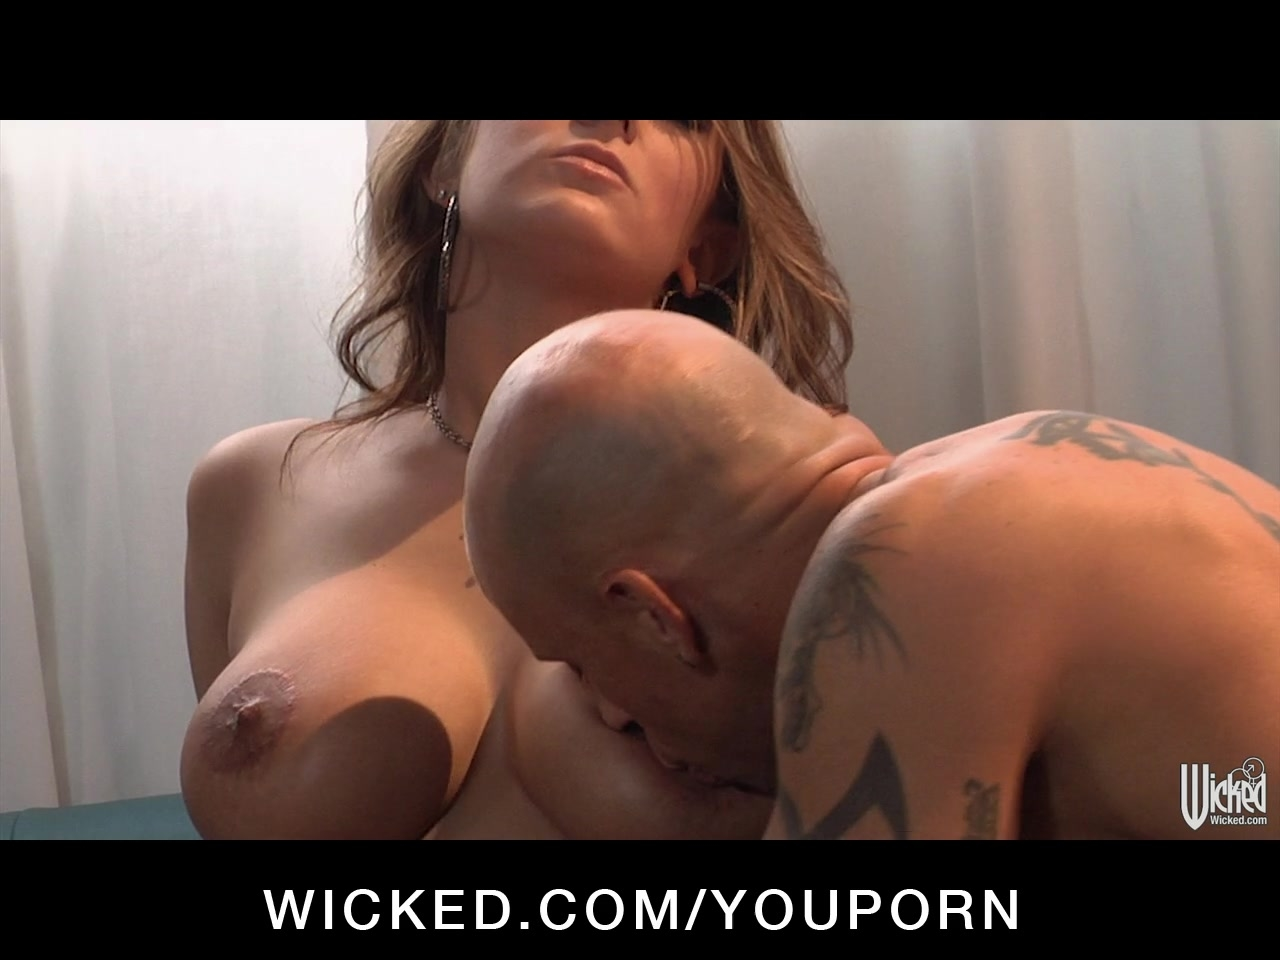 Horny Big-tit Blonde slut in heels is ass-fucked hard by big-dick